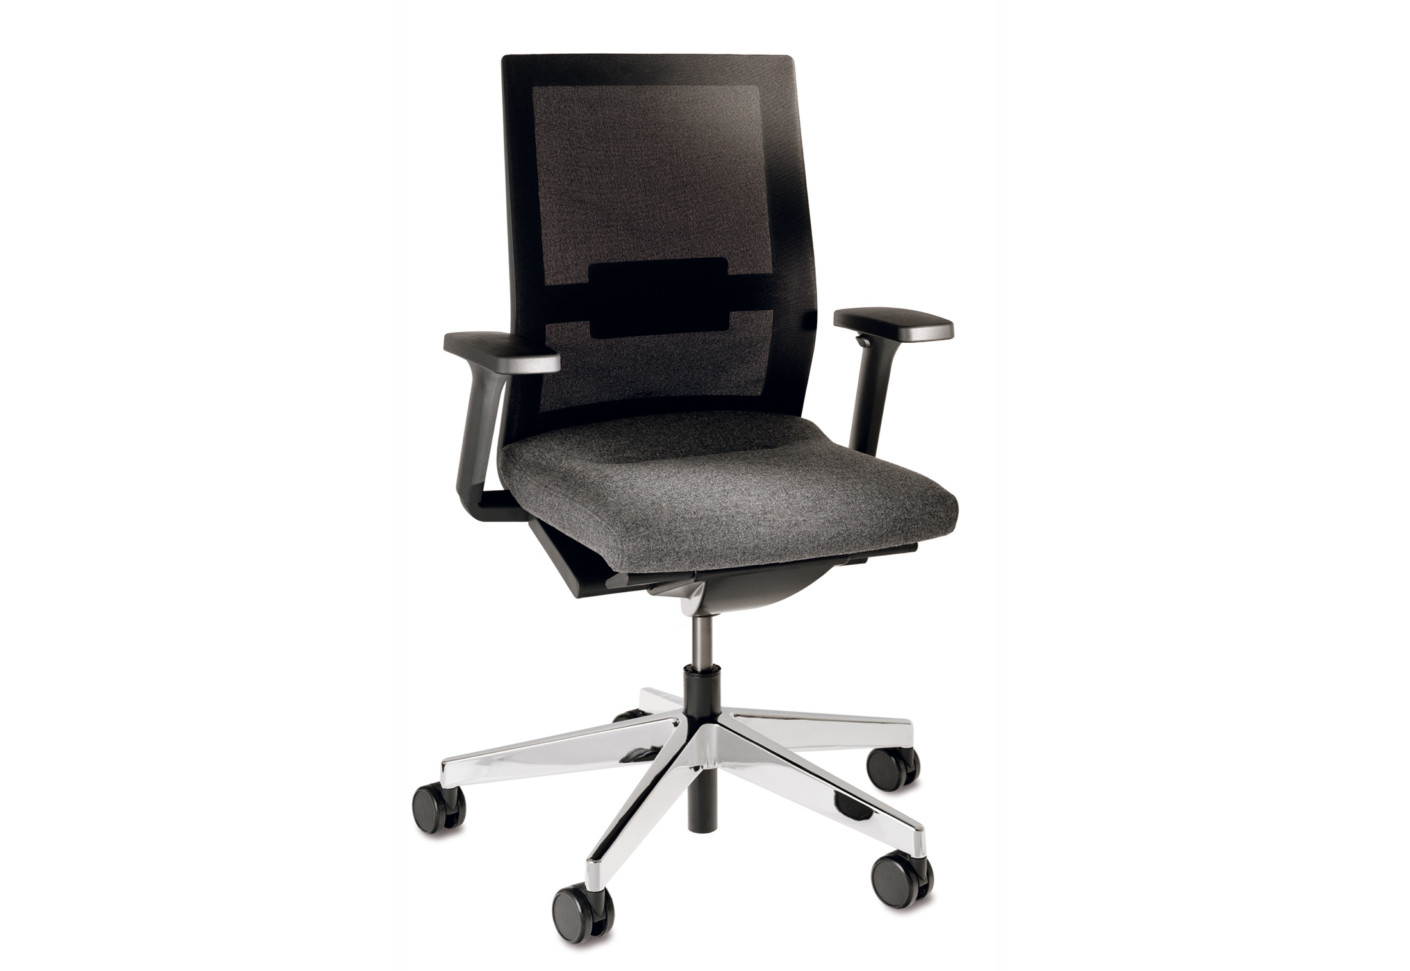 Neos 181 6 Swivel Chair Membran By Wilkhahn Stylepark